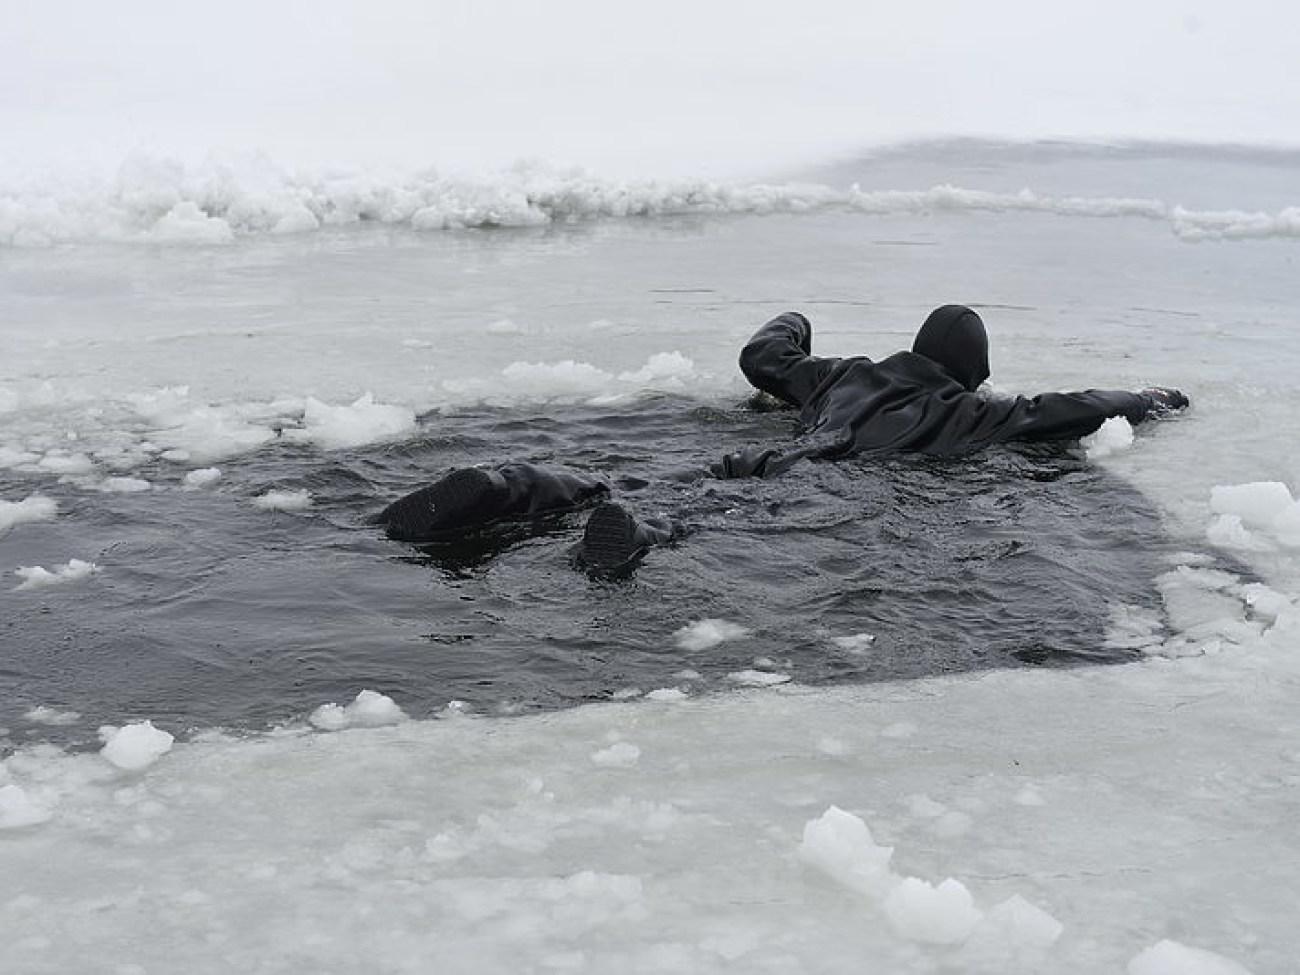 Картинка провалился под лед